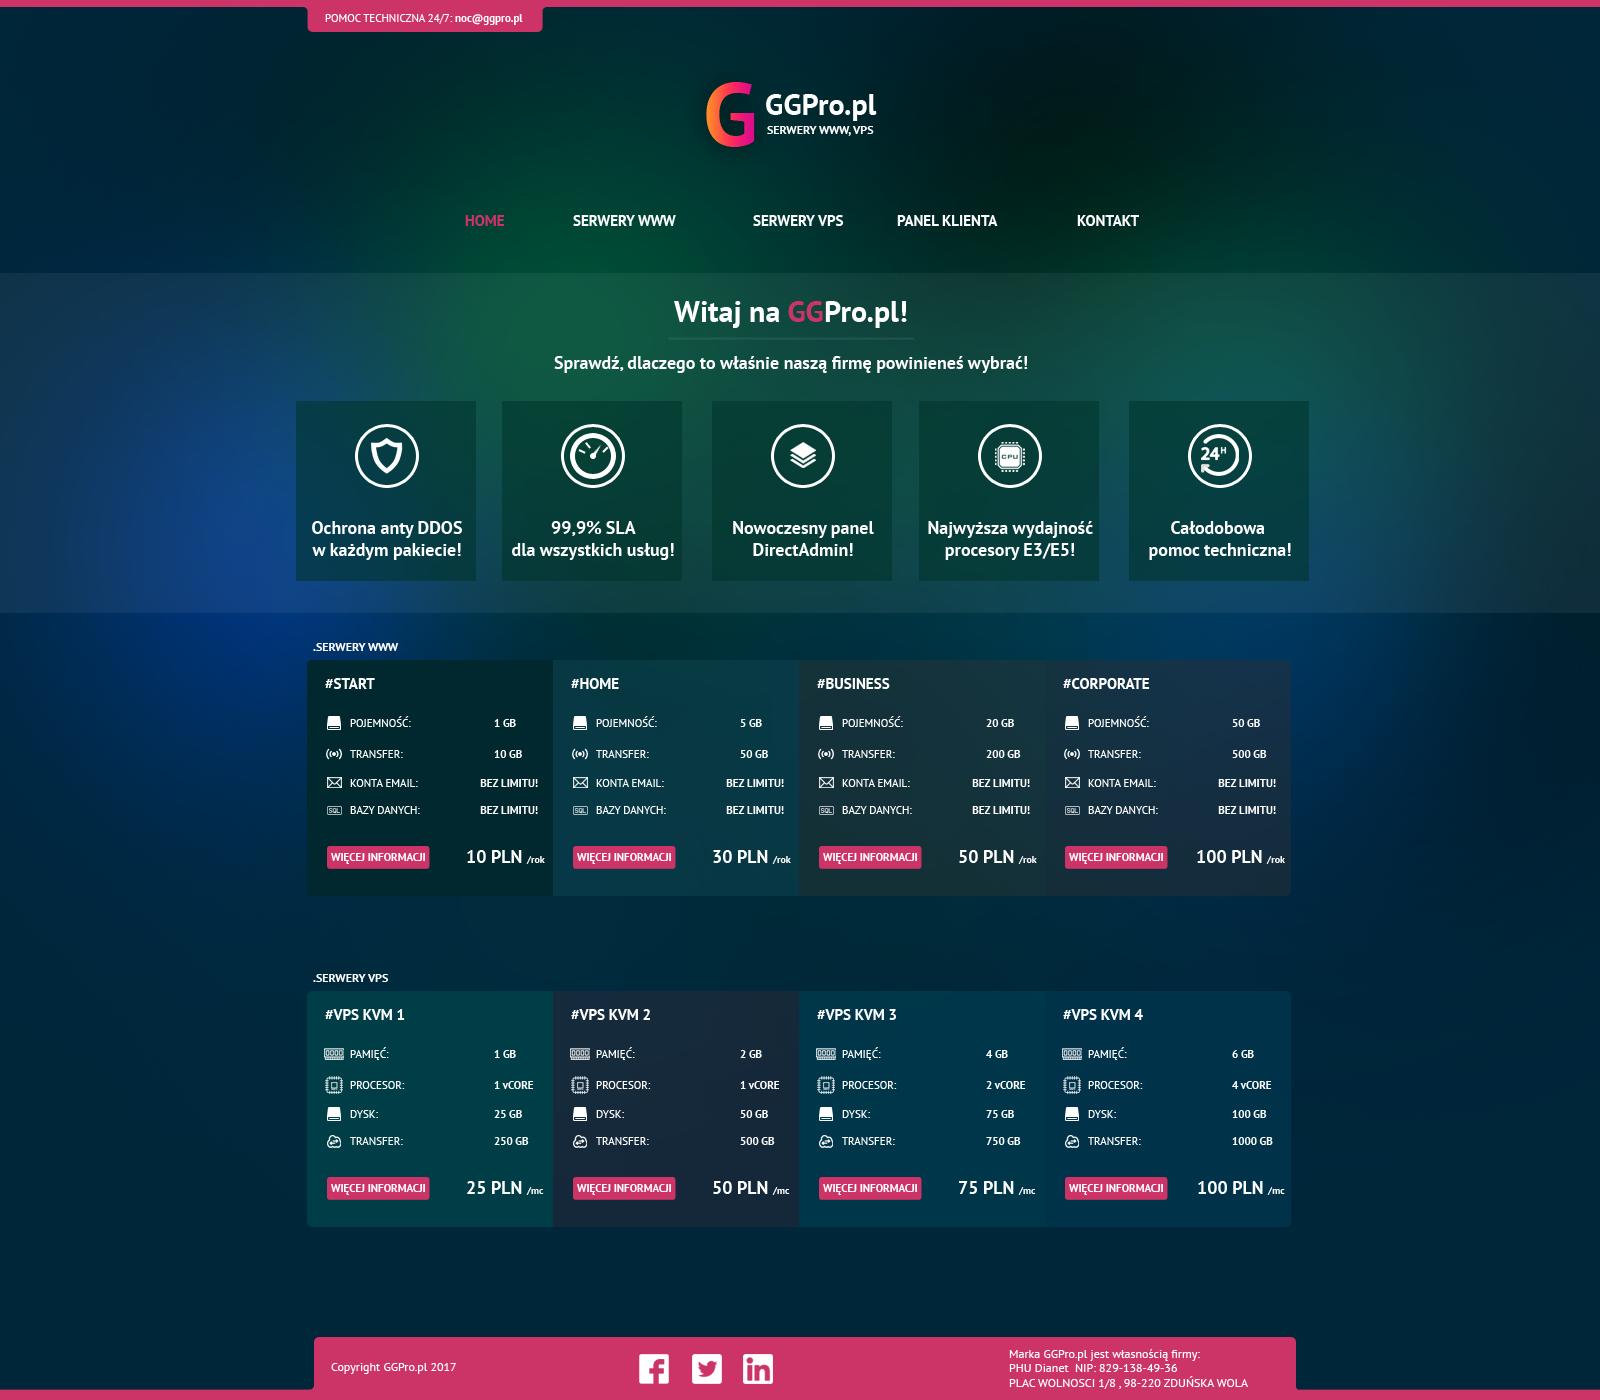 GGPro.pl - Hosting, vps by miguslaw